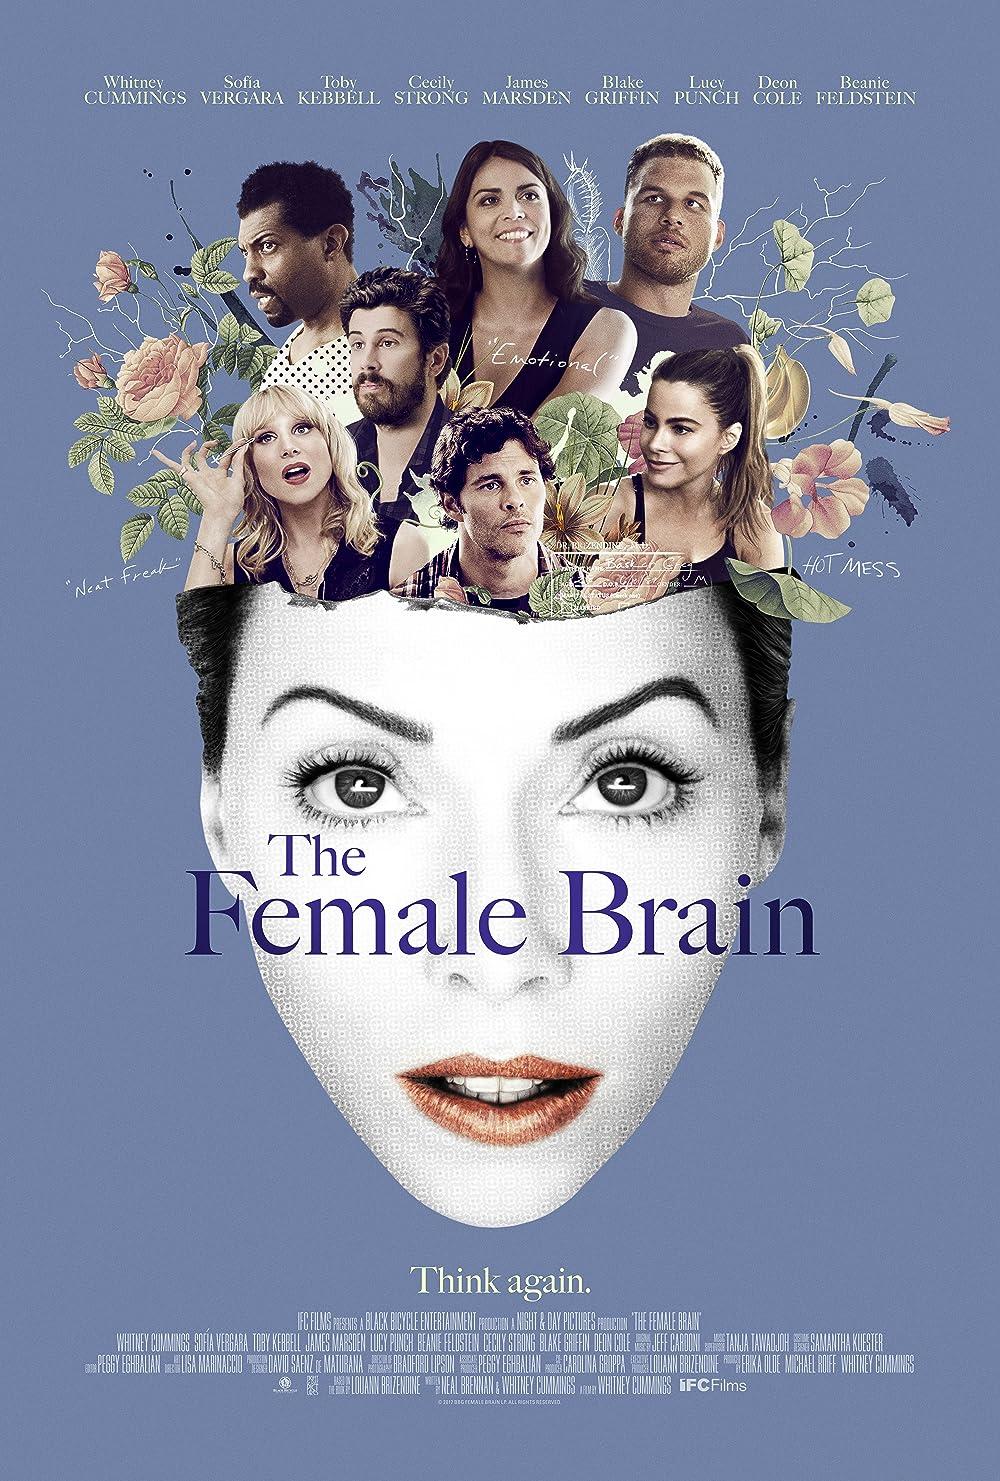 Feminine brain the The new